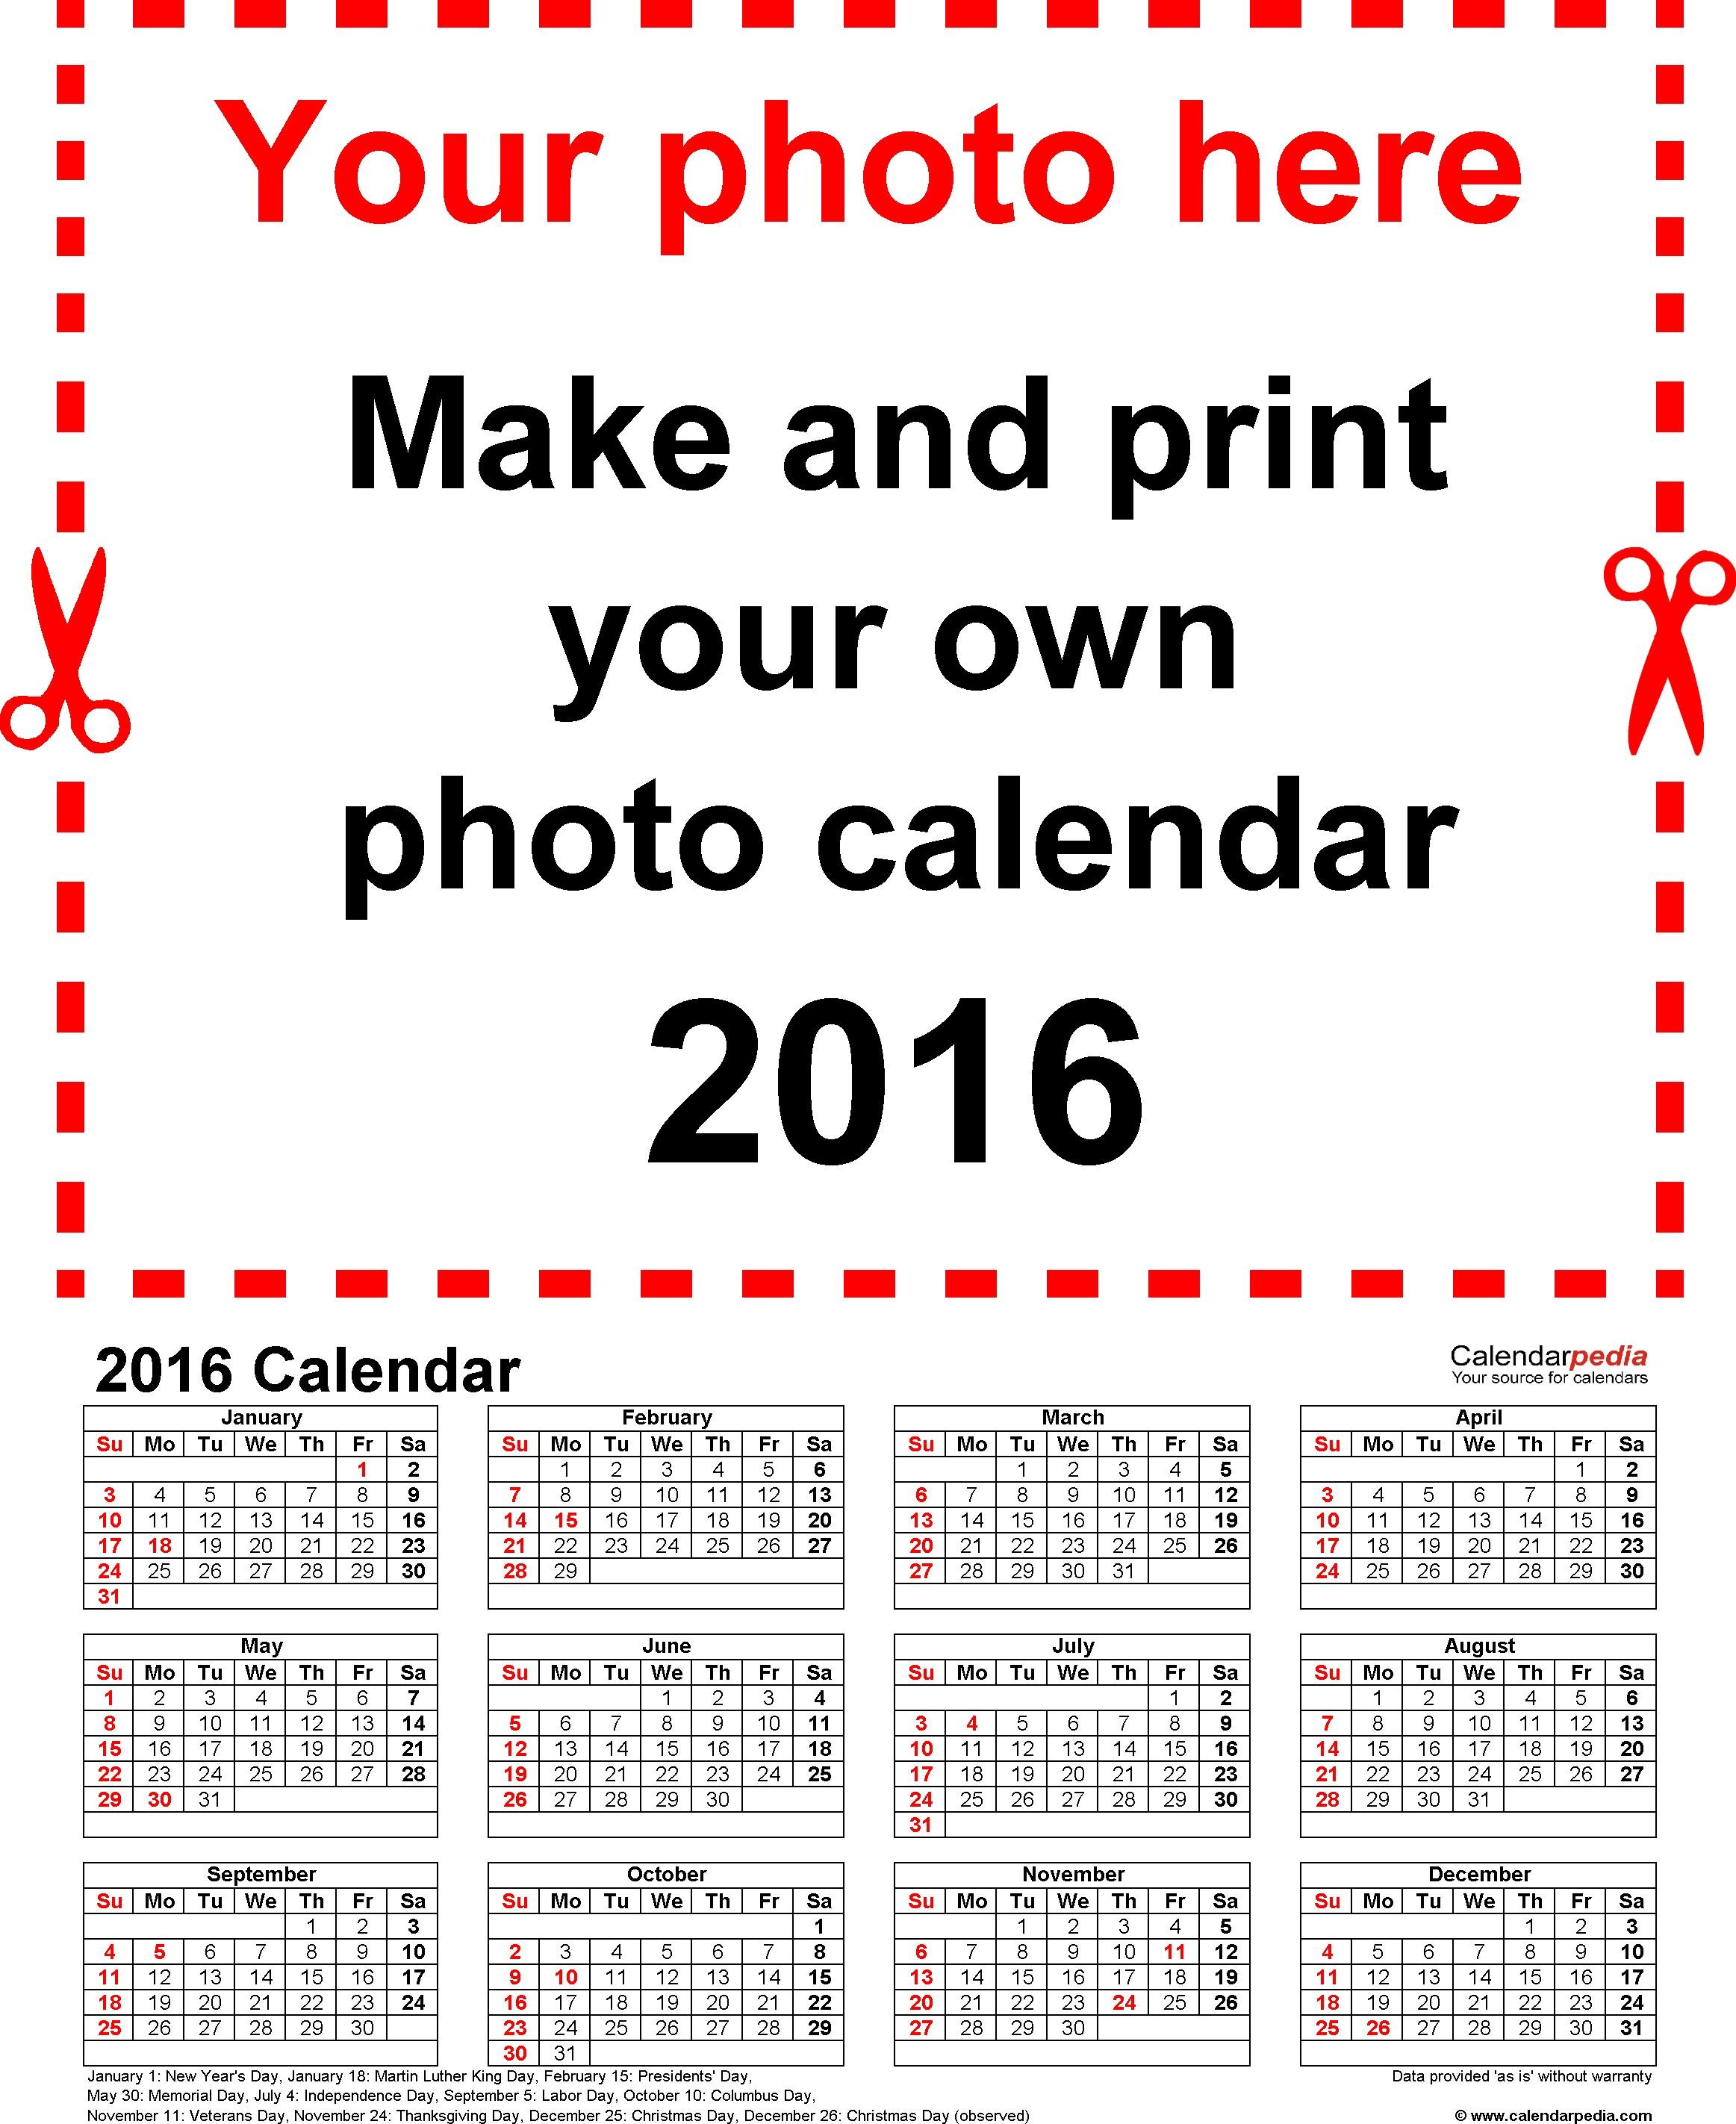 2019 Calendar Philippines Excel Más Recientes Best Create Calendar Template Year Calendar Template Of 2019 Calendar Philippines Excel Más Actual Angelsapna 93angelsapna On Pinterest